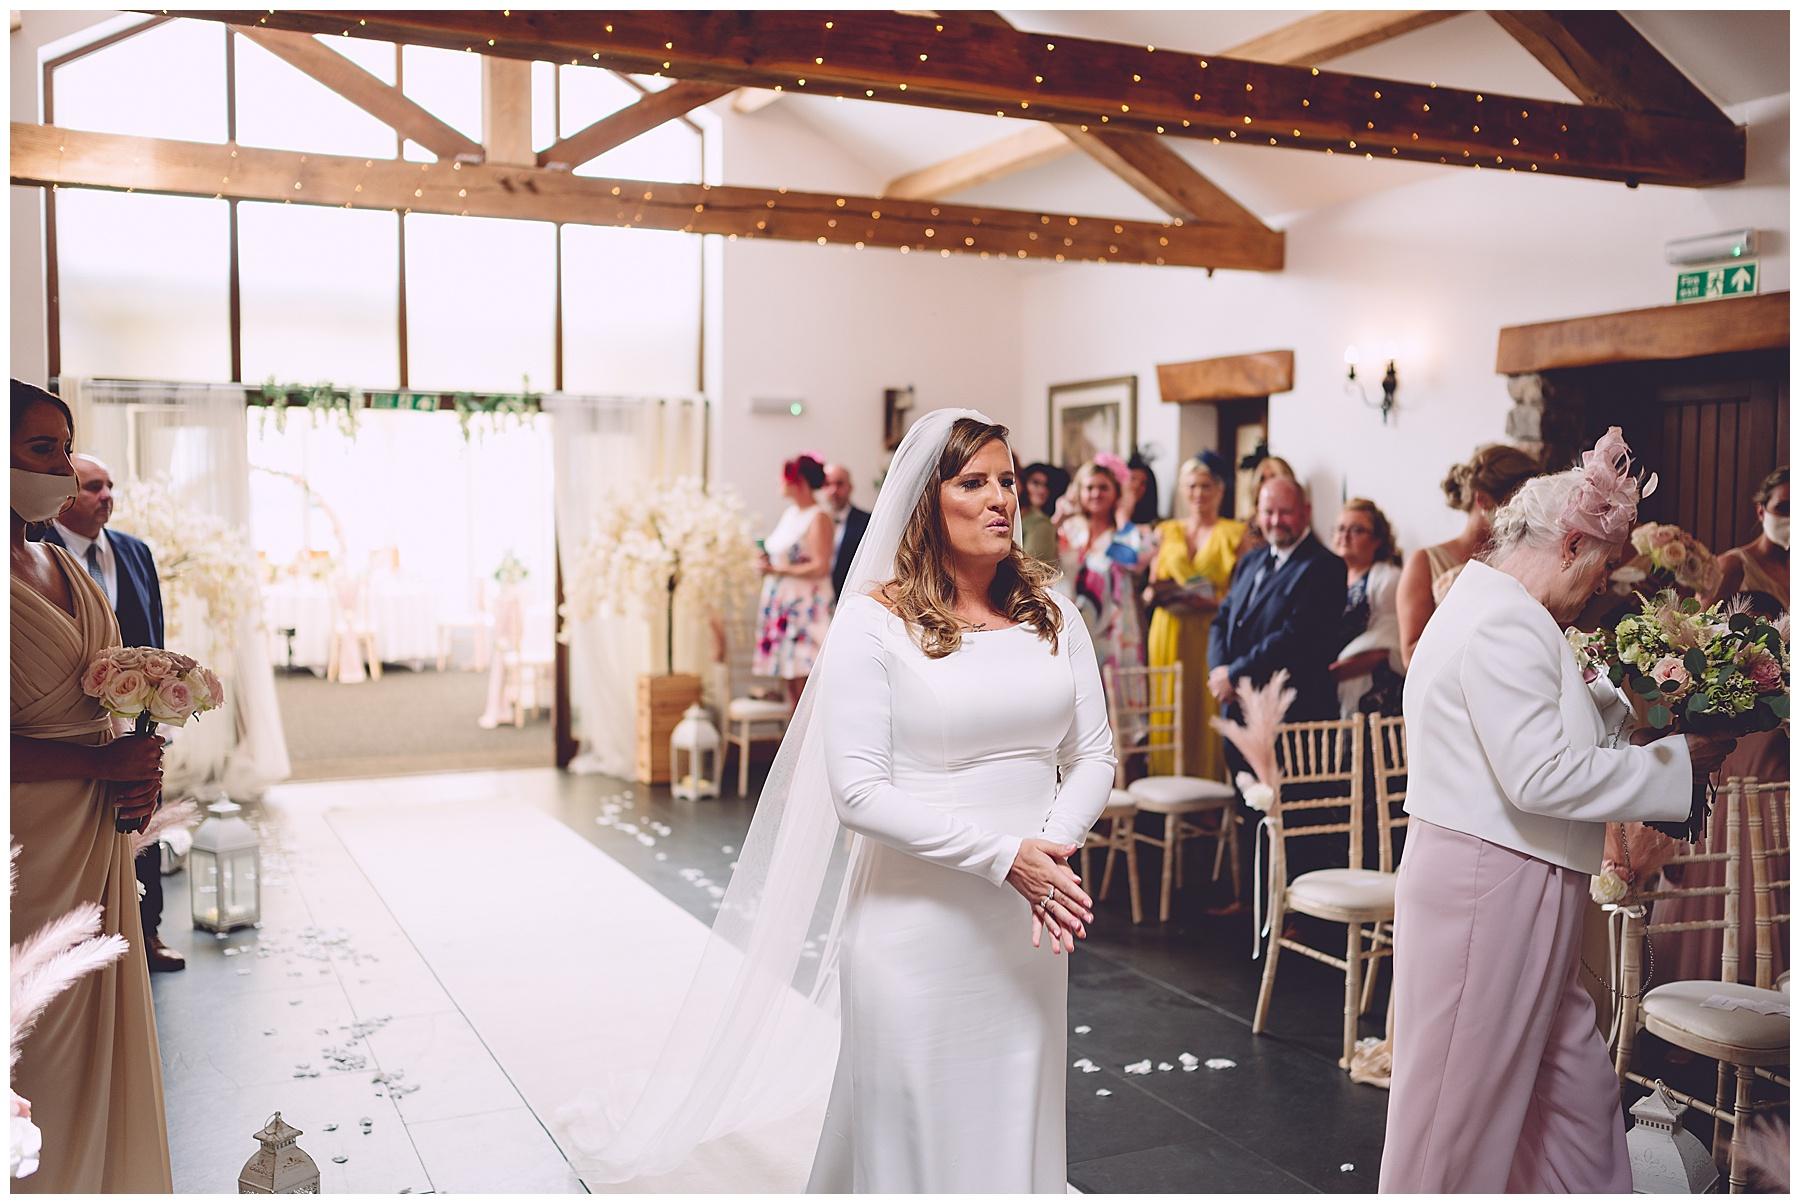 Wedding at Ocean View Gower